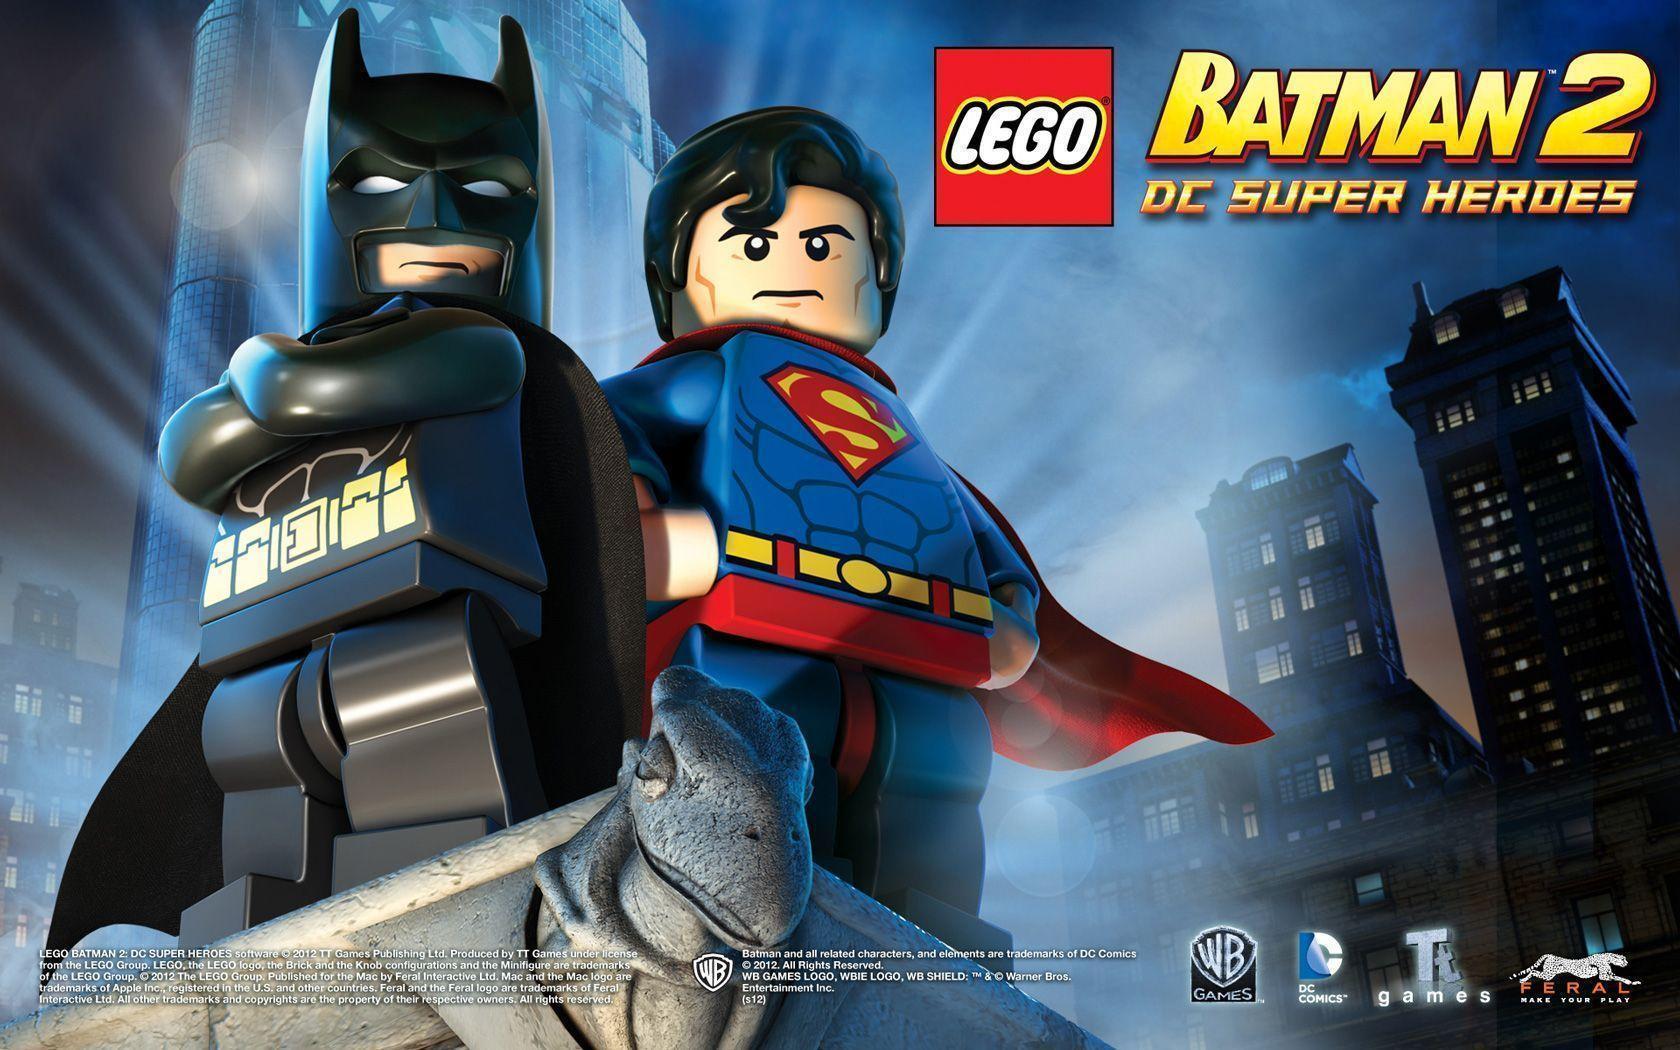 lego batman 2 wallpaper flash - photo #7